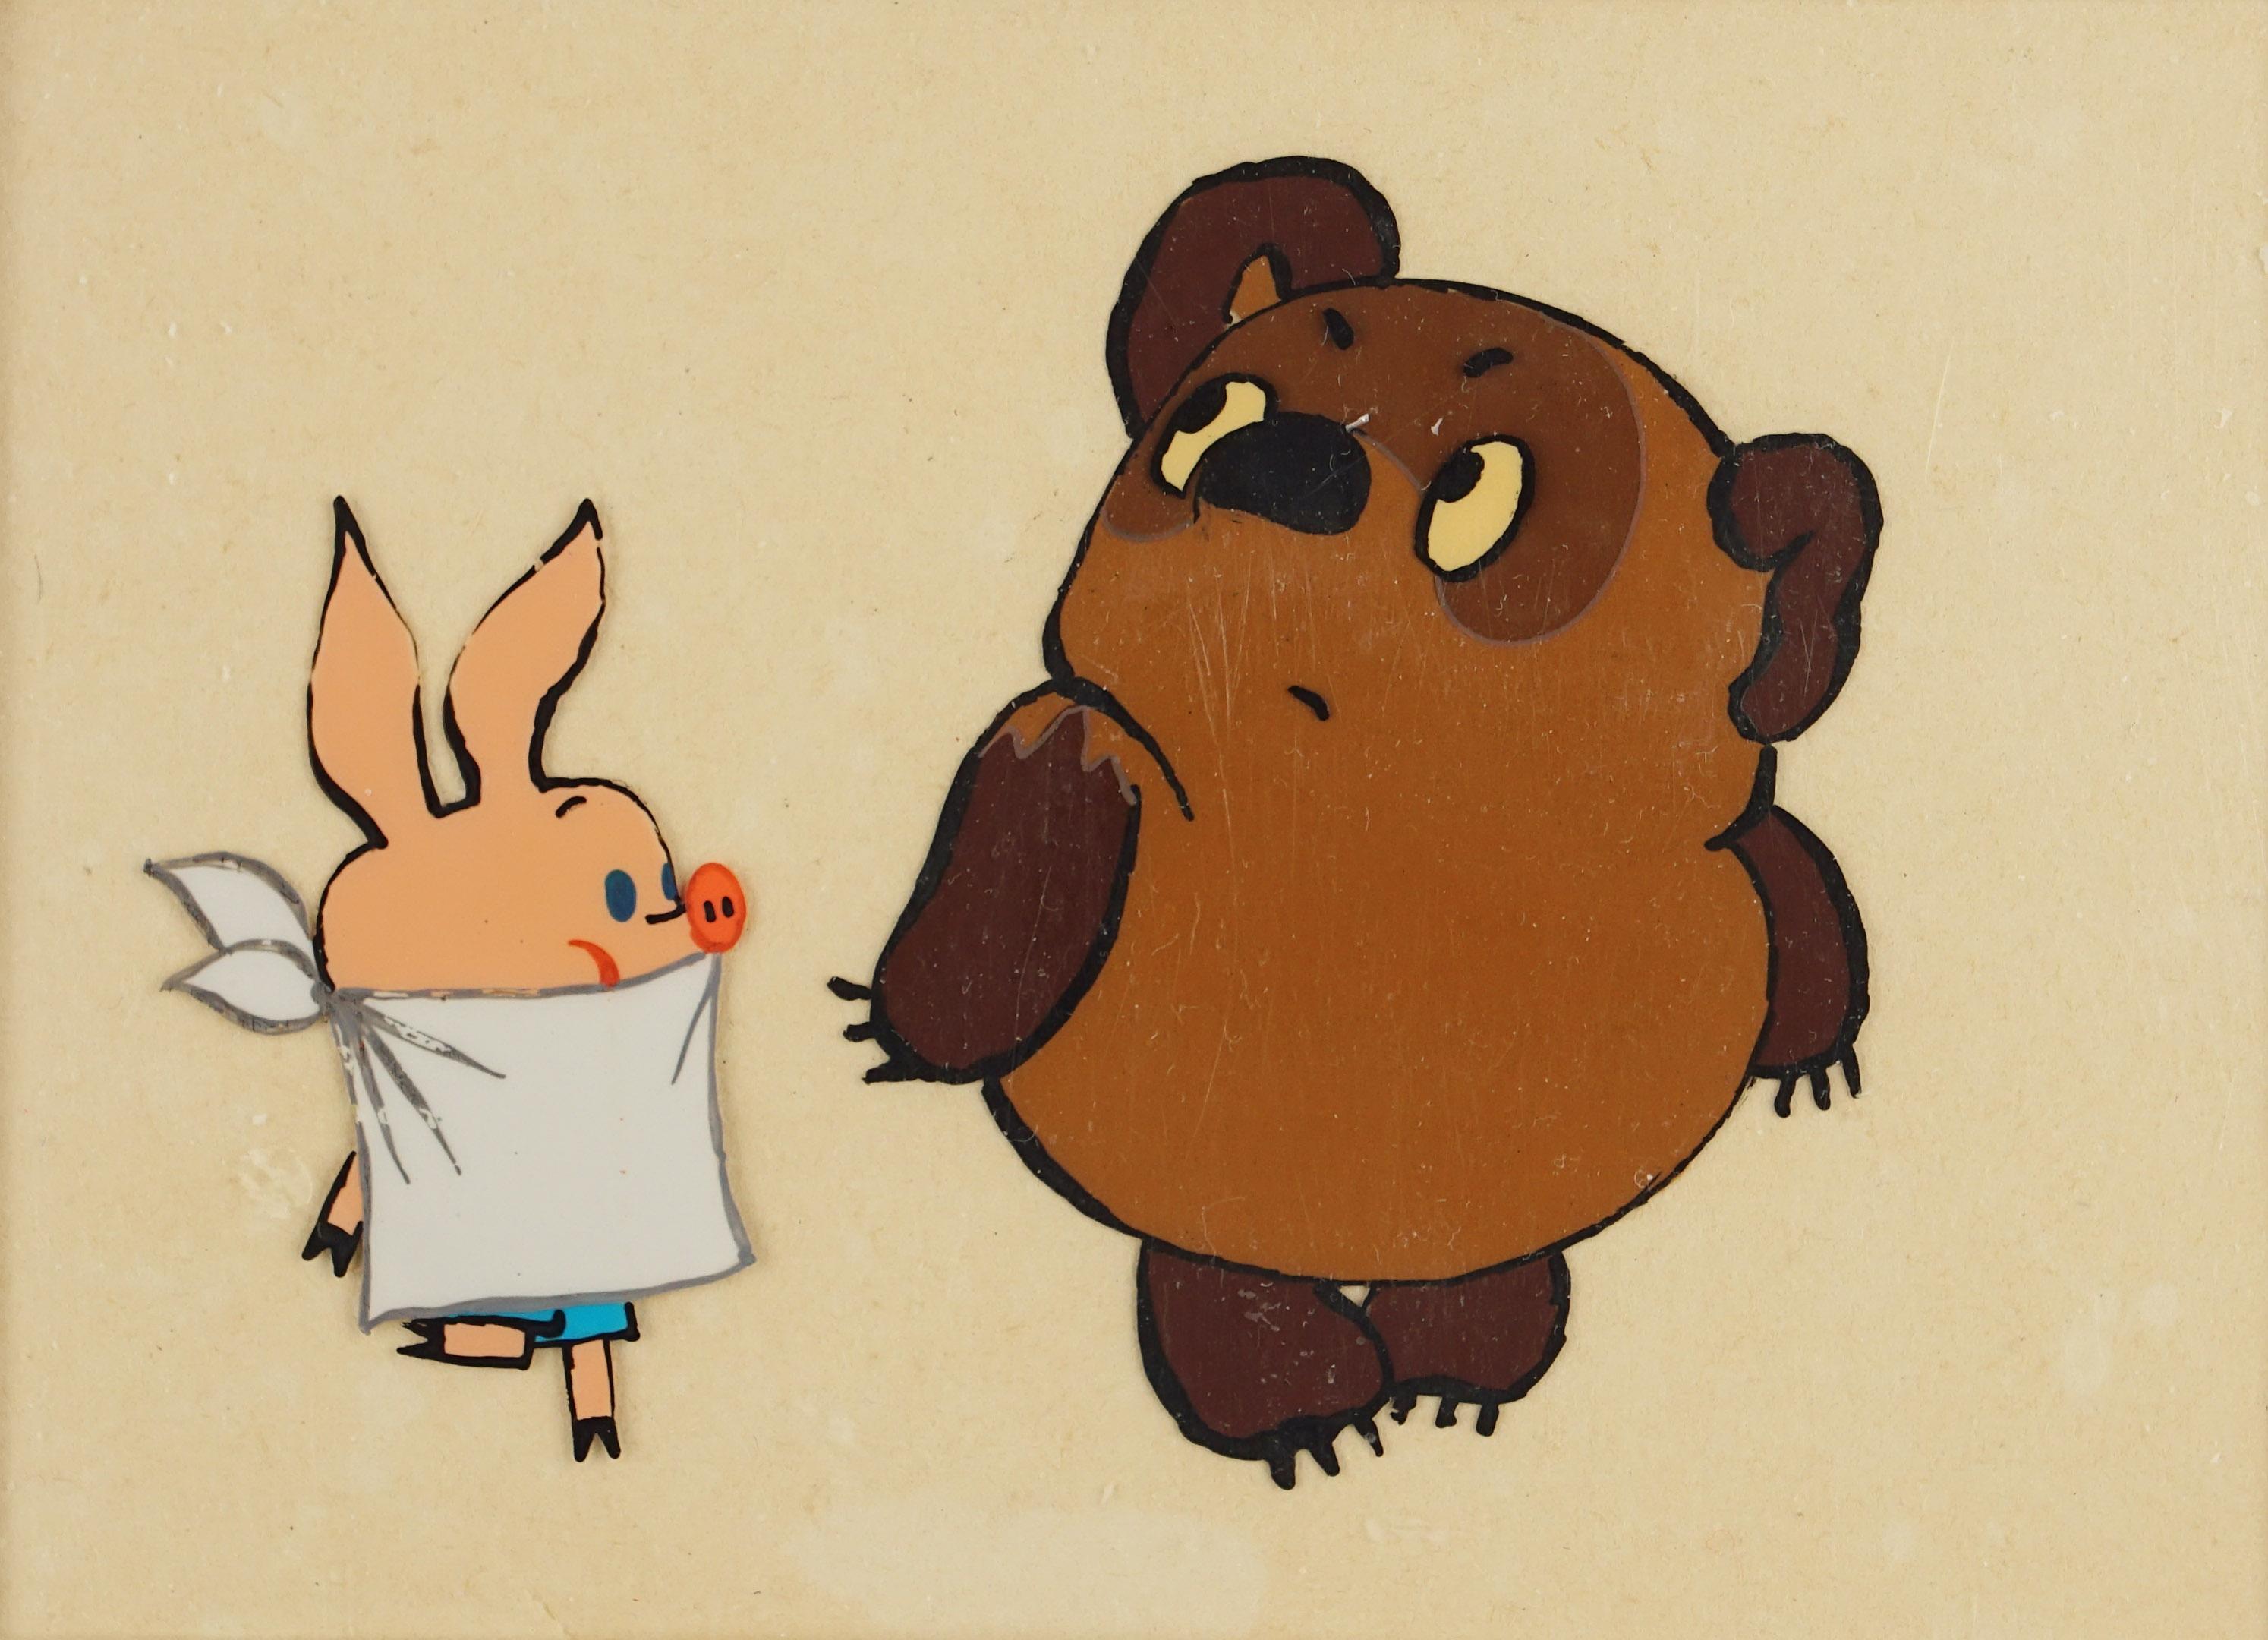 Картинка винни пуха пятачка и кролика виды обезьян